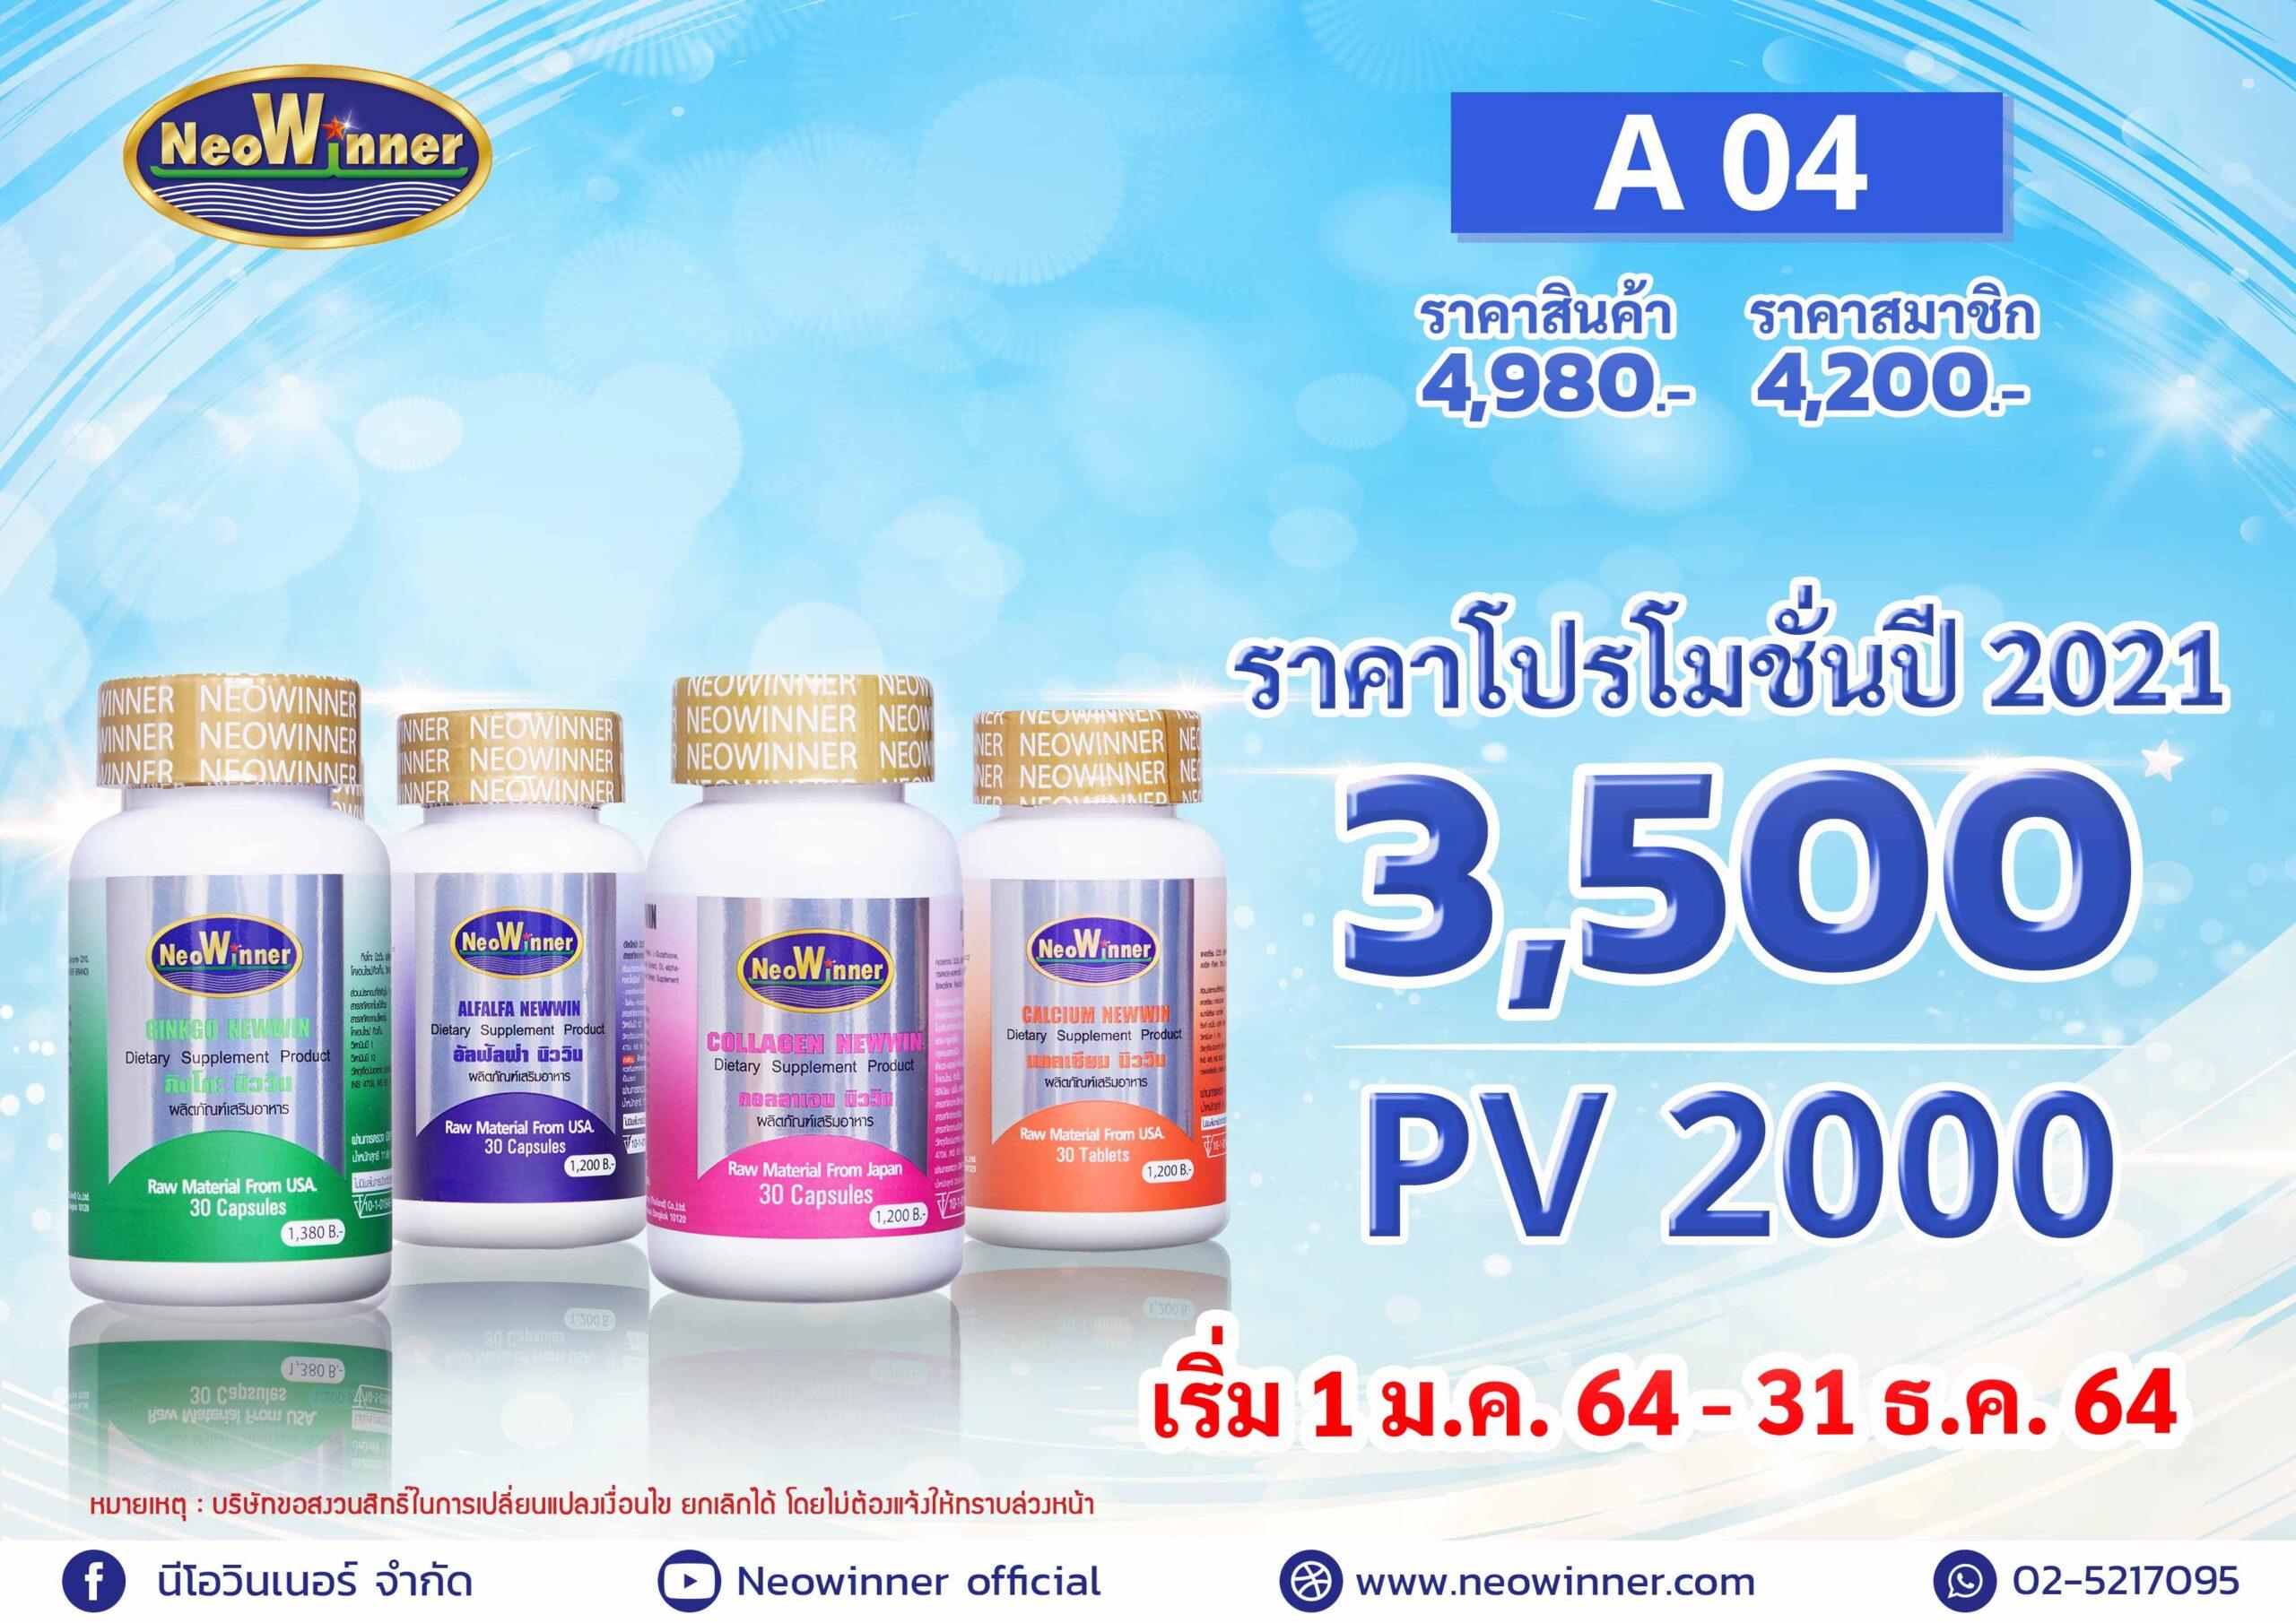 Promotion-A-04-2021